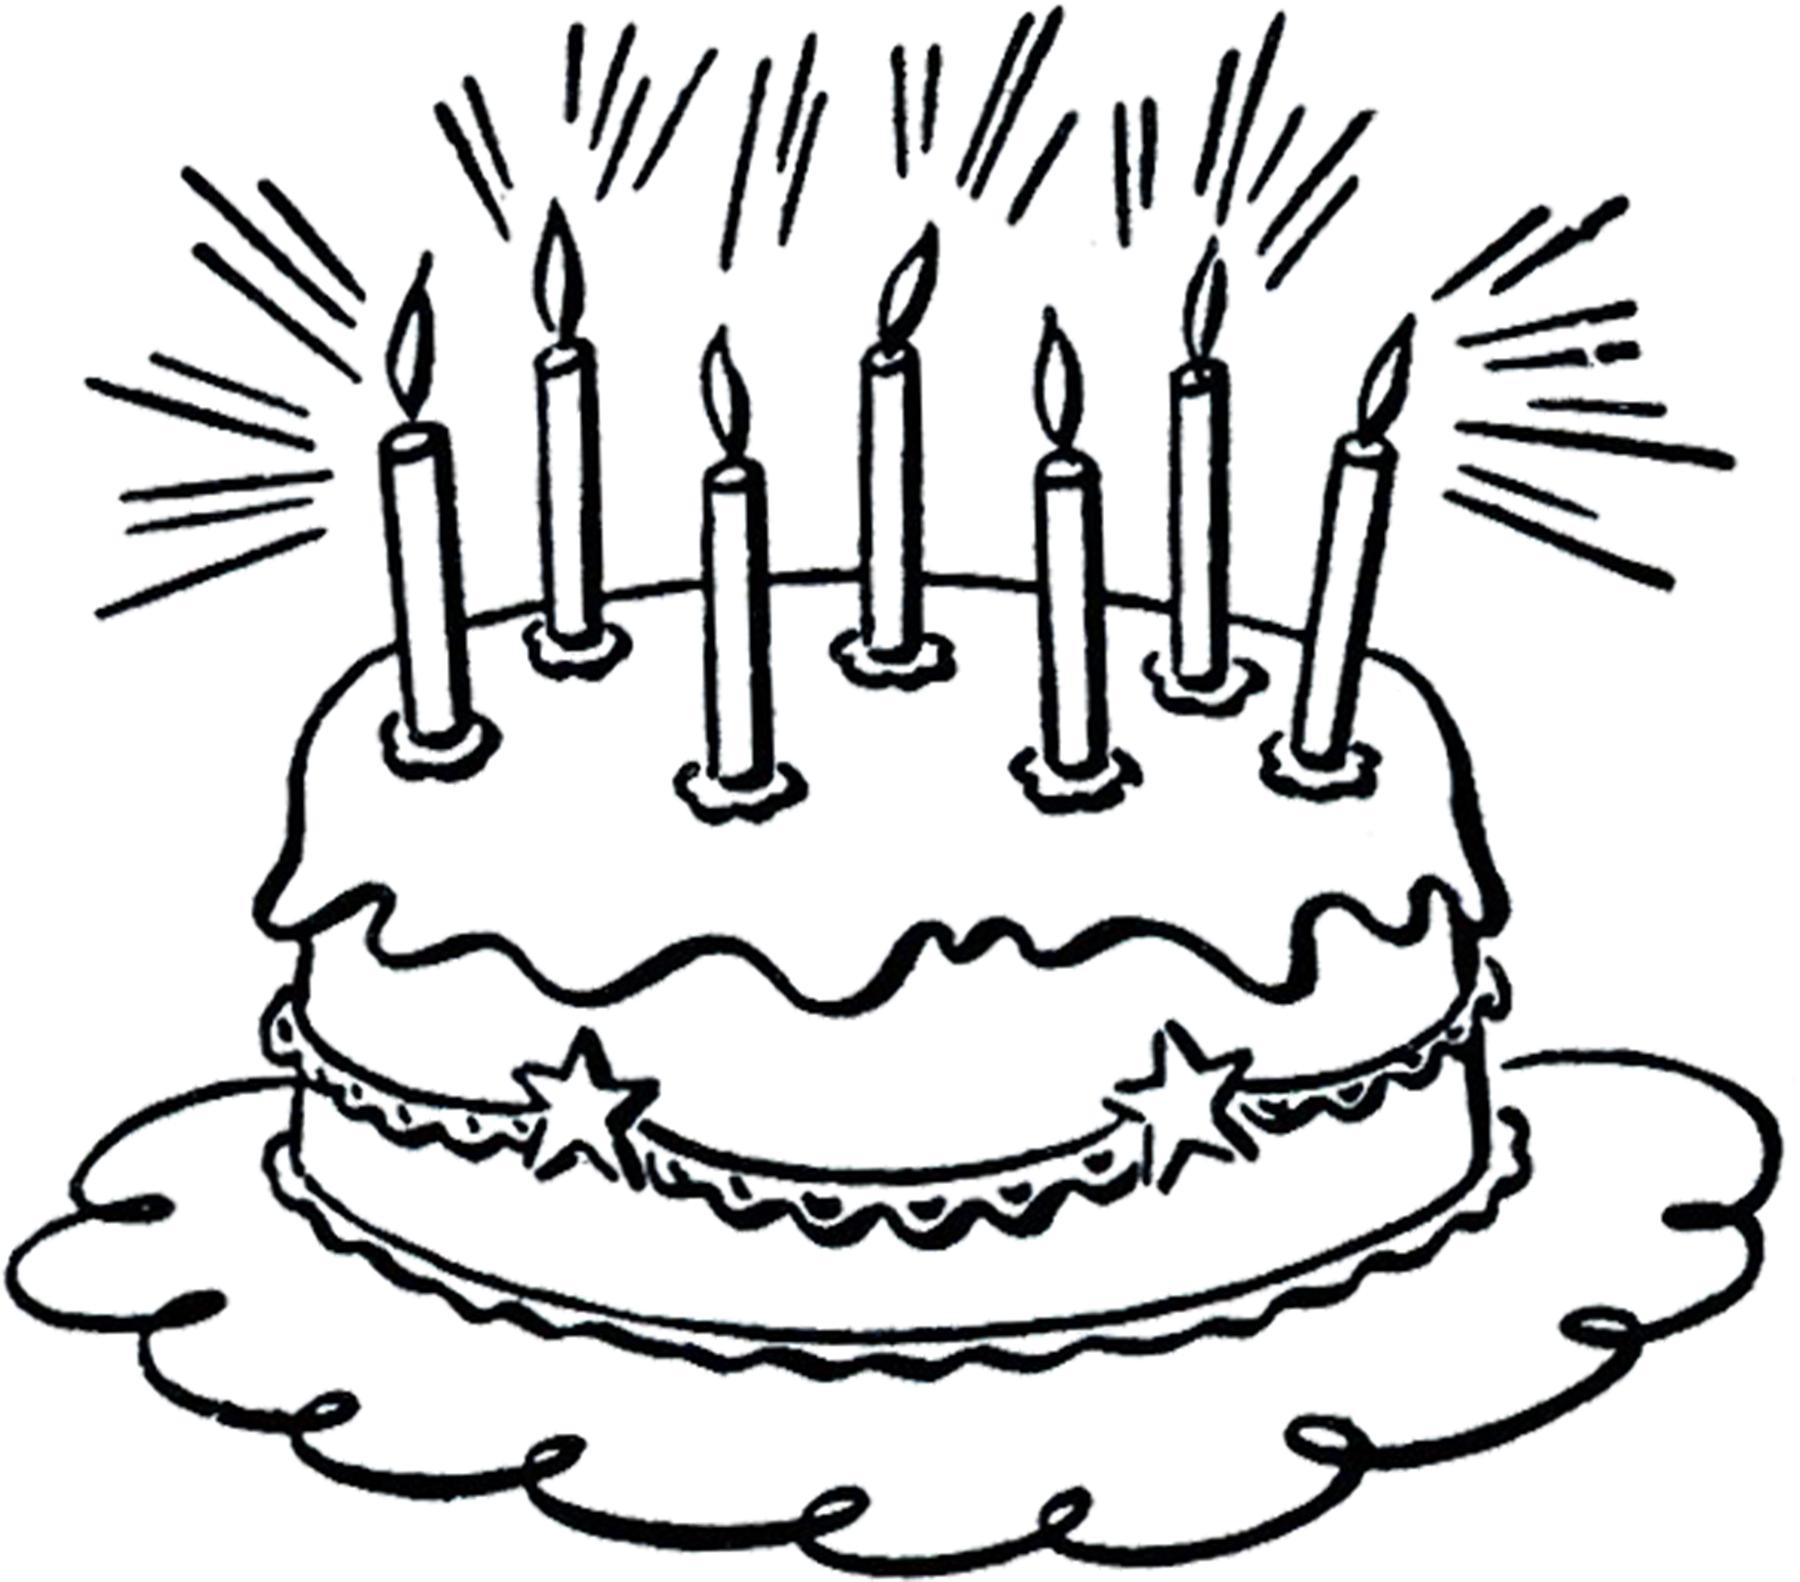 1800x1582 Vintage Birthday Cake Line Art Cakes